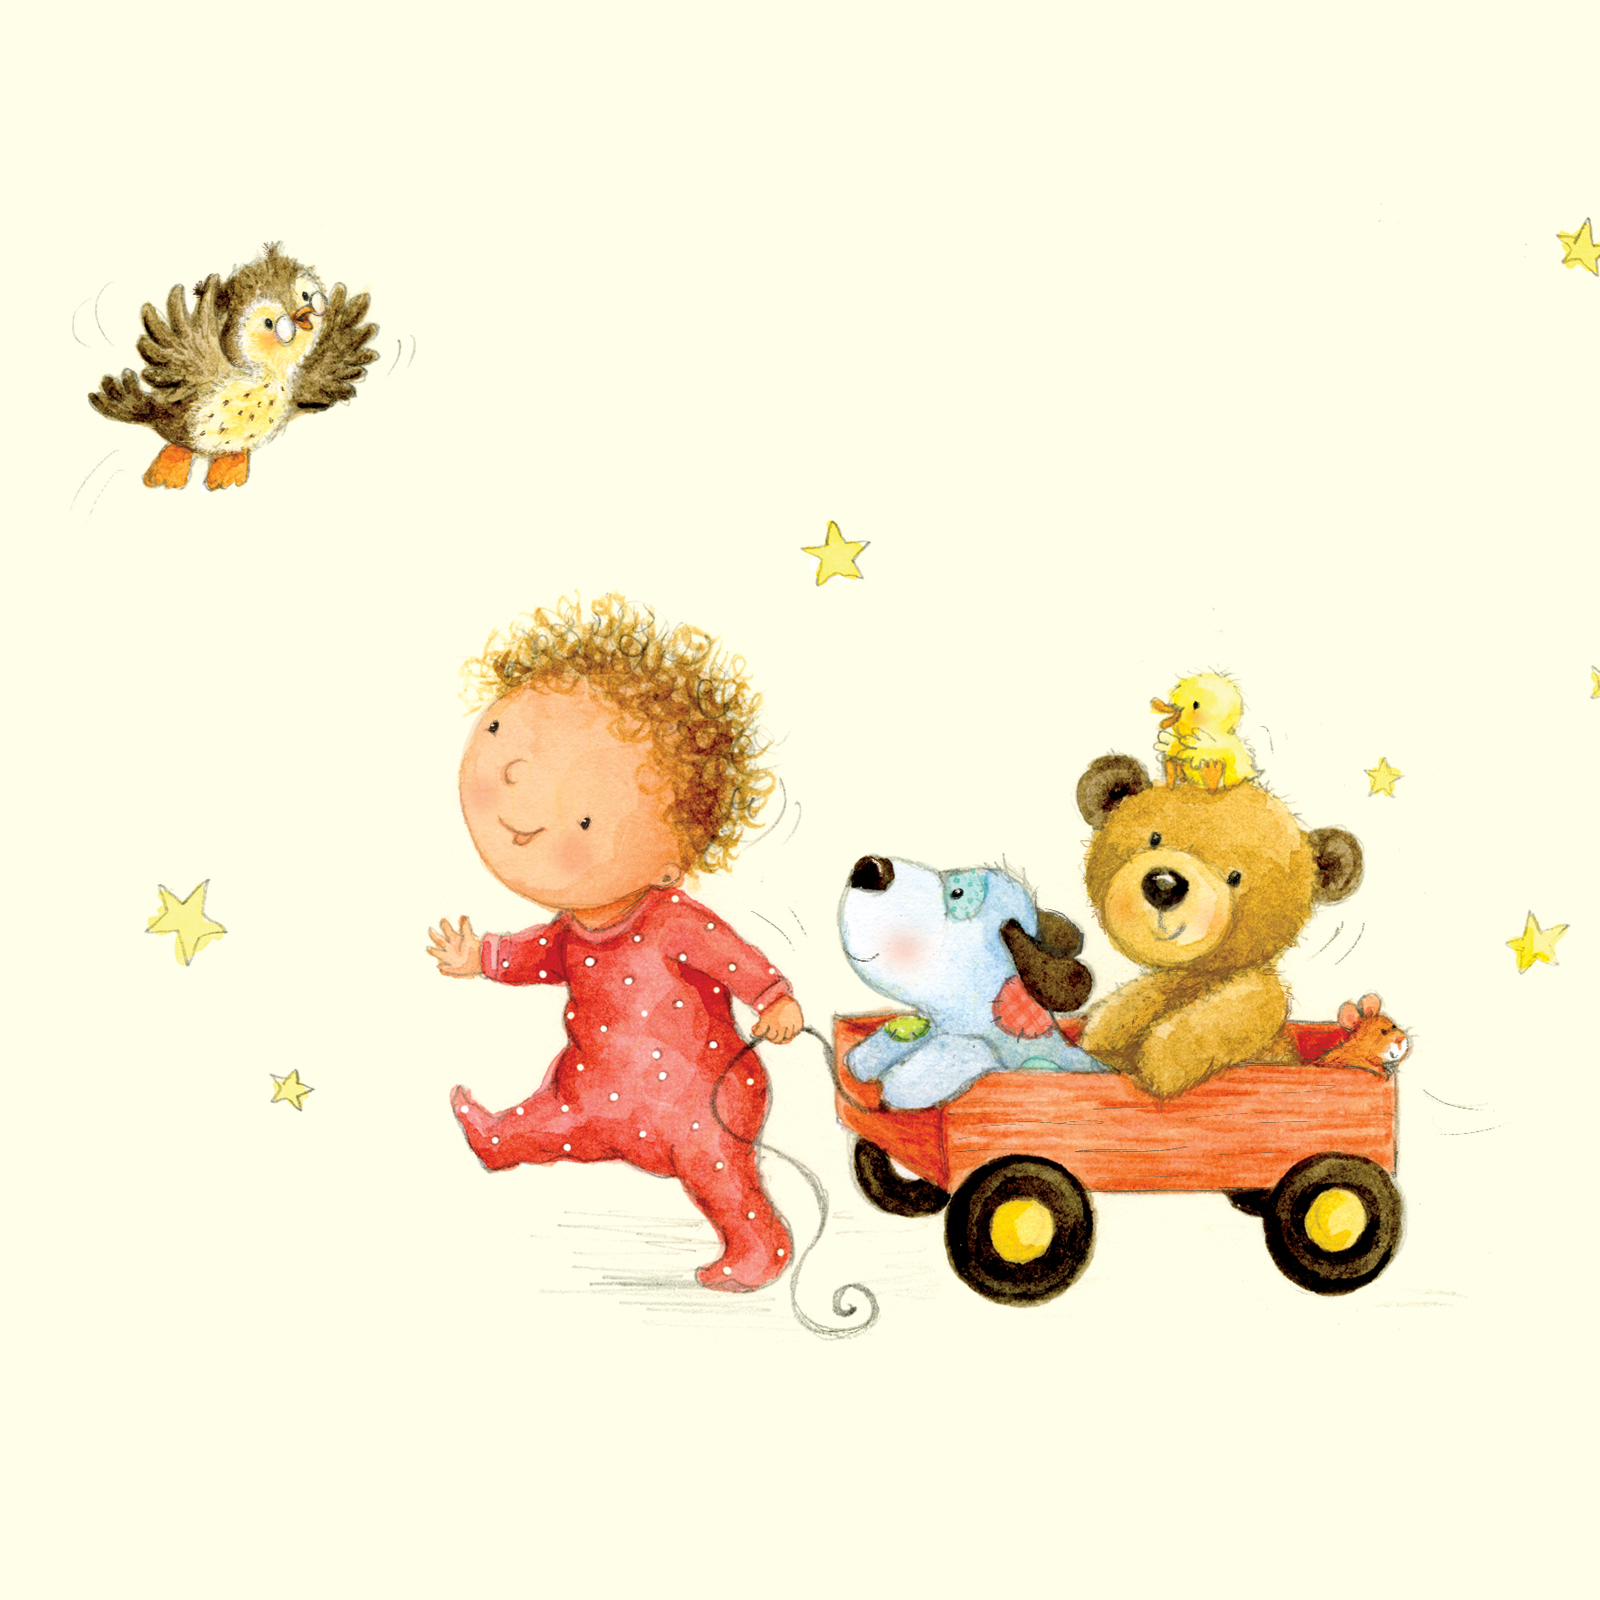 baby pulling cart_illustration_gail yerrill